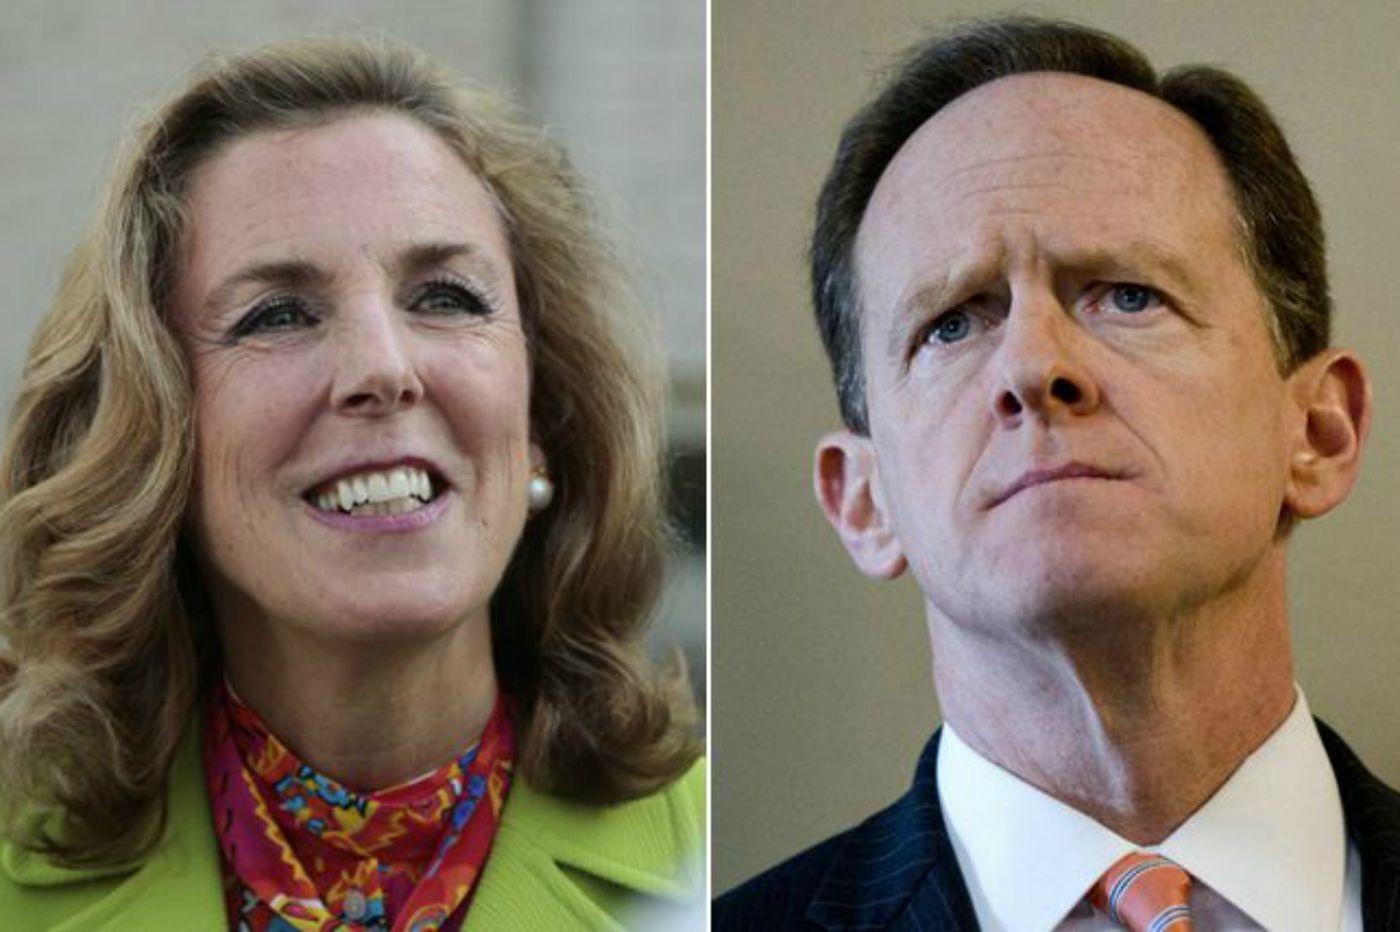 Money talks loudly in attack ads for Pennsylvania's Senate campaign